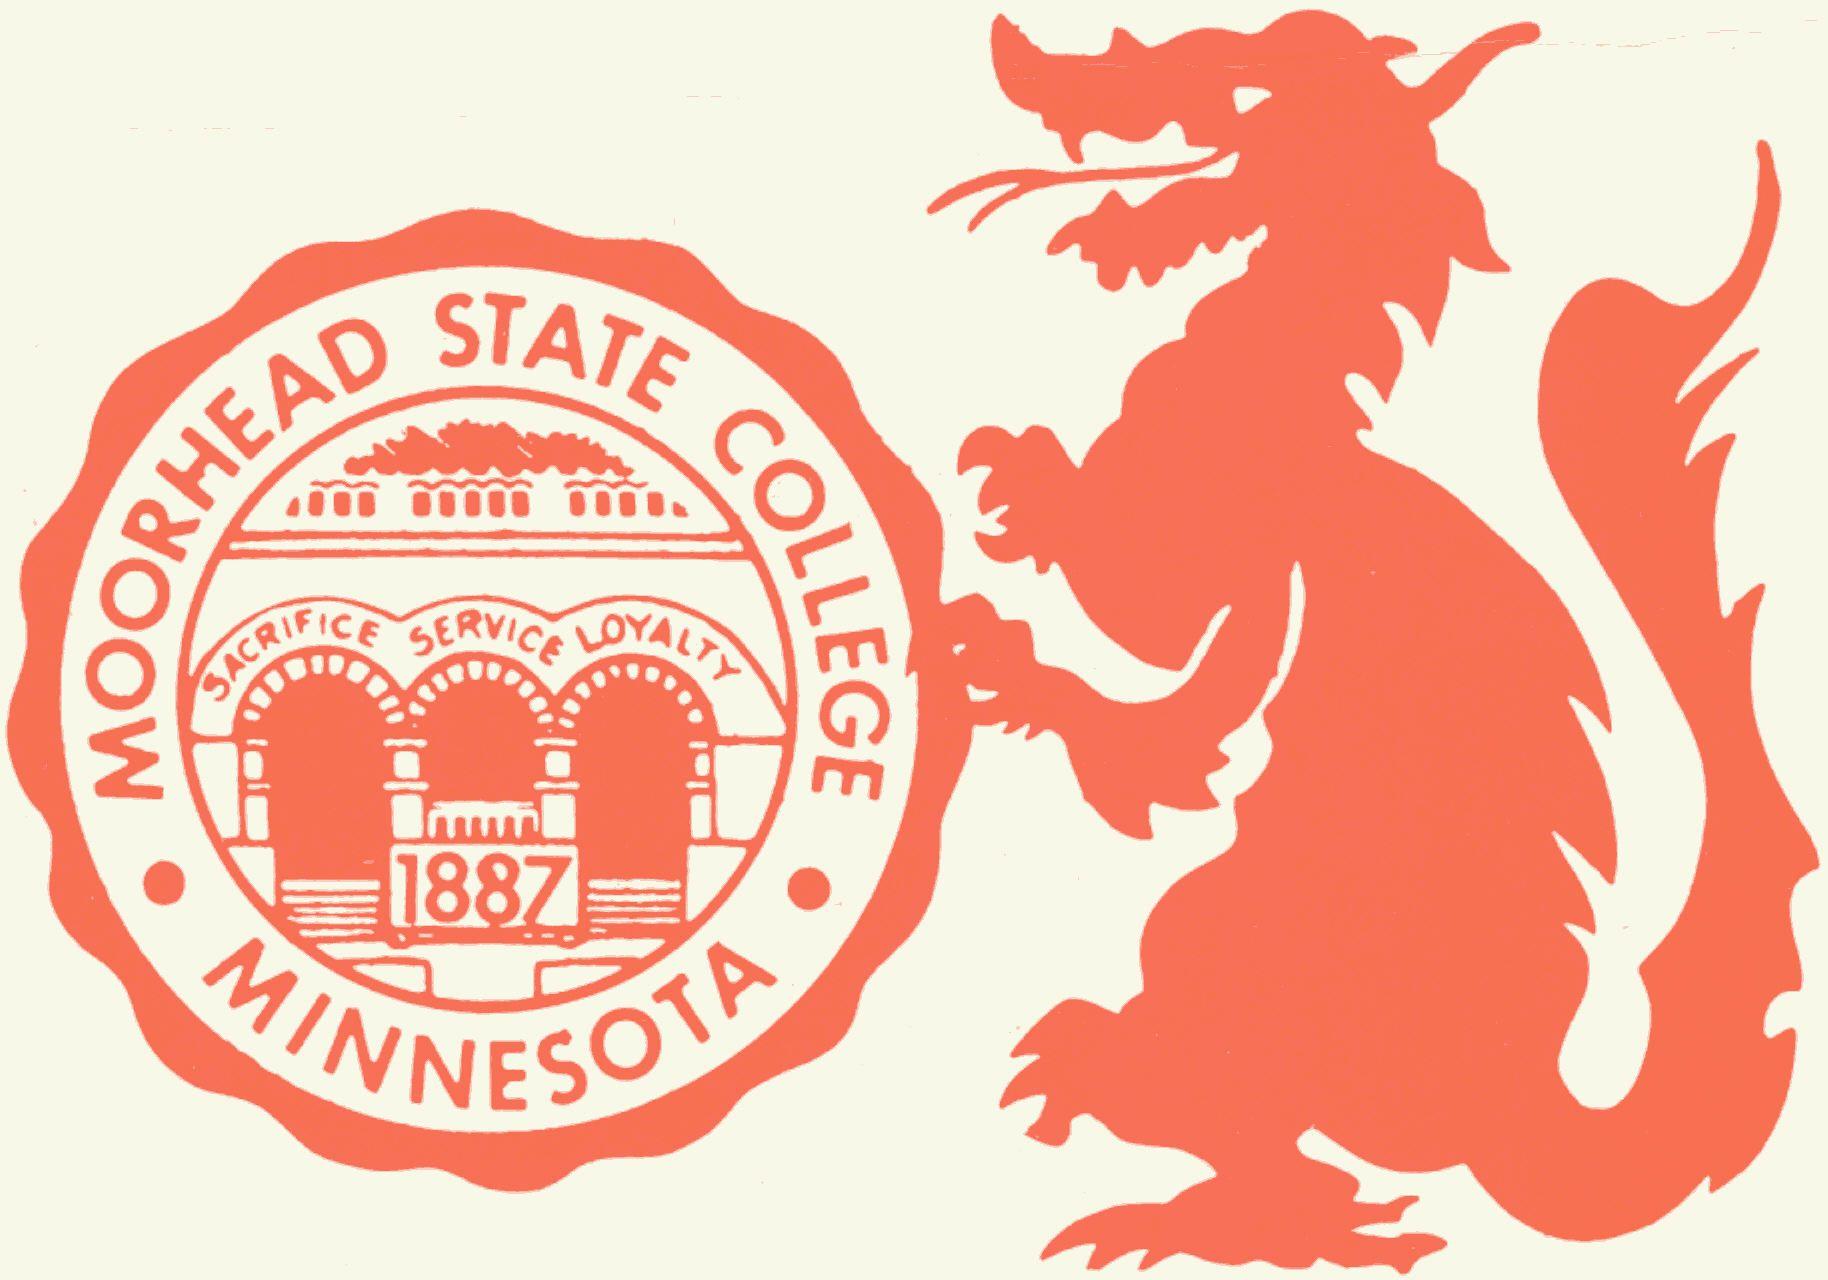 Moorhead state dragon logo dragon logo moorhead - Interior design classes minneapolis ...